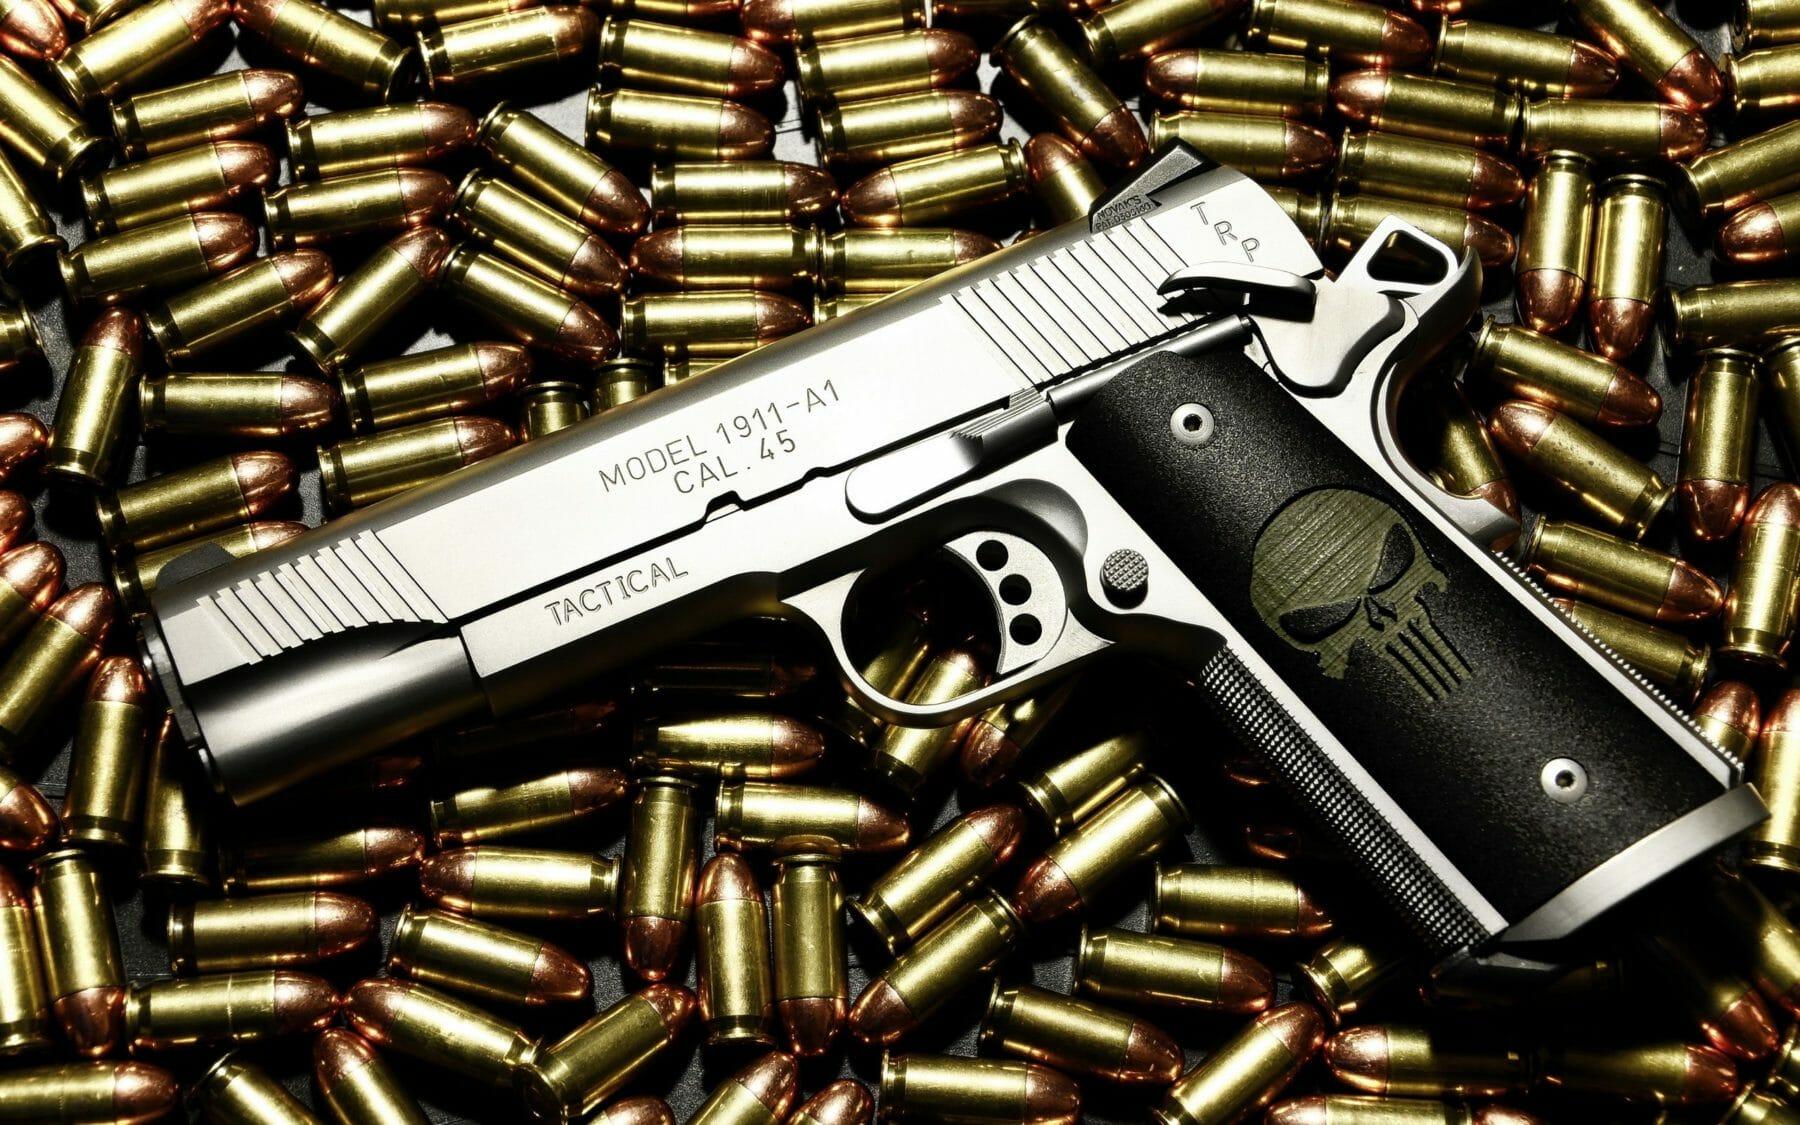 Prince George Search Warrant Results In Significant Gun Seizure